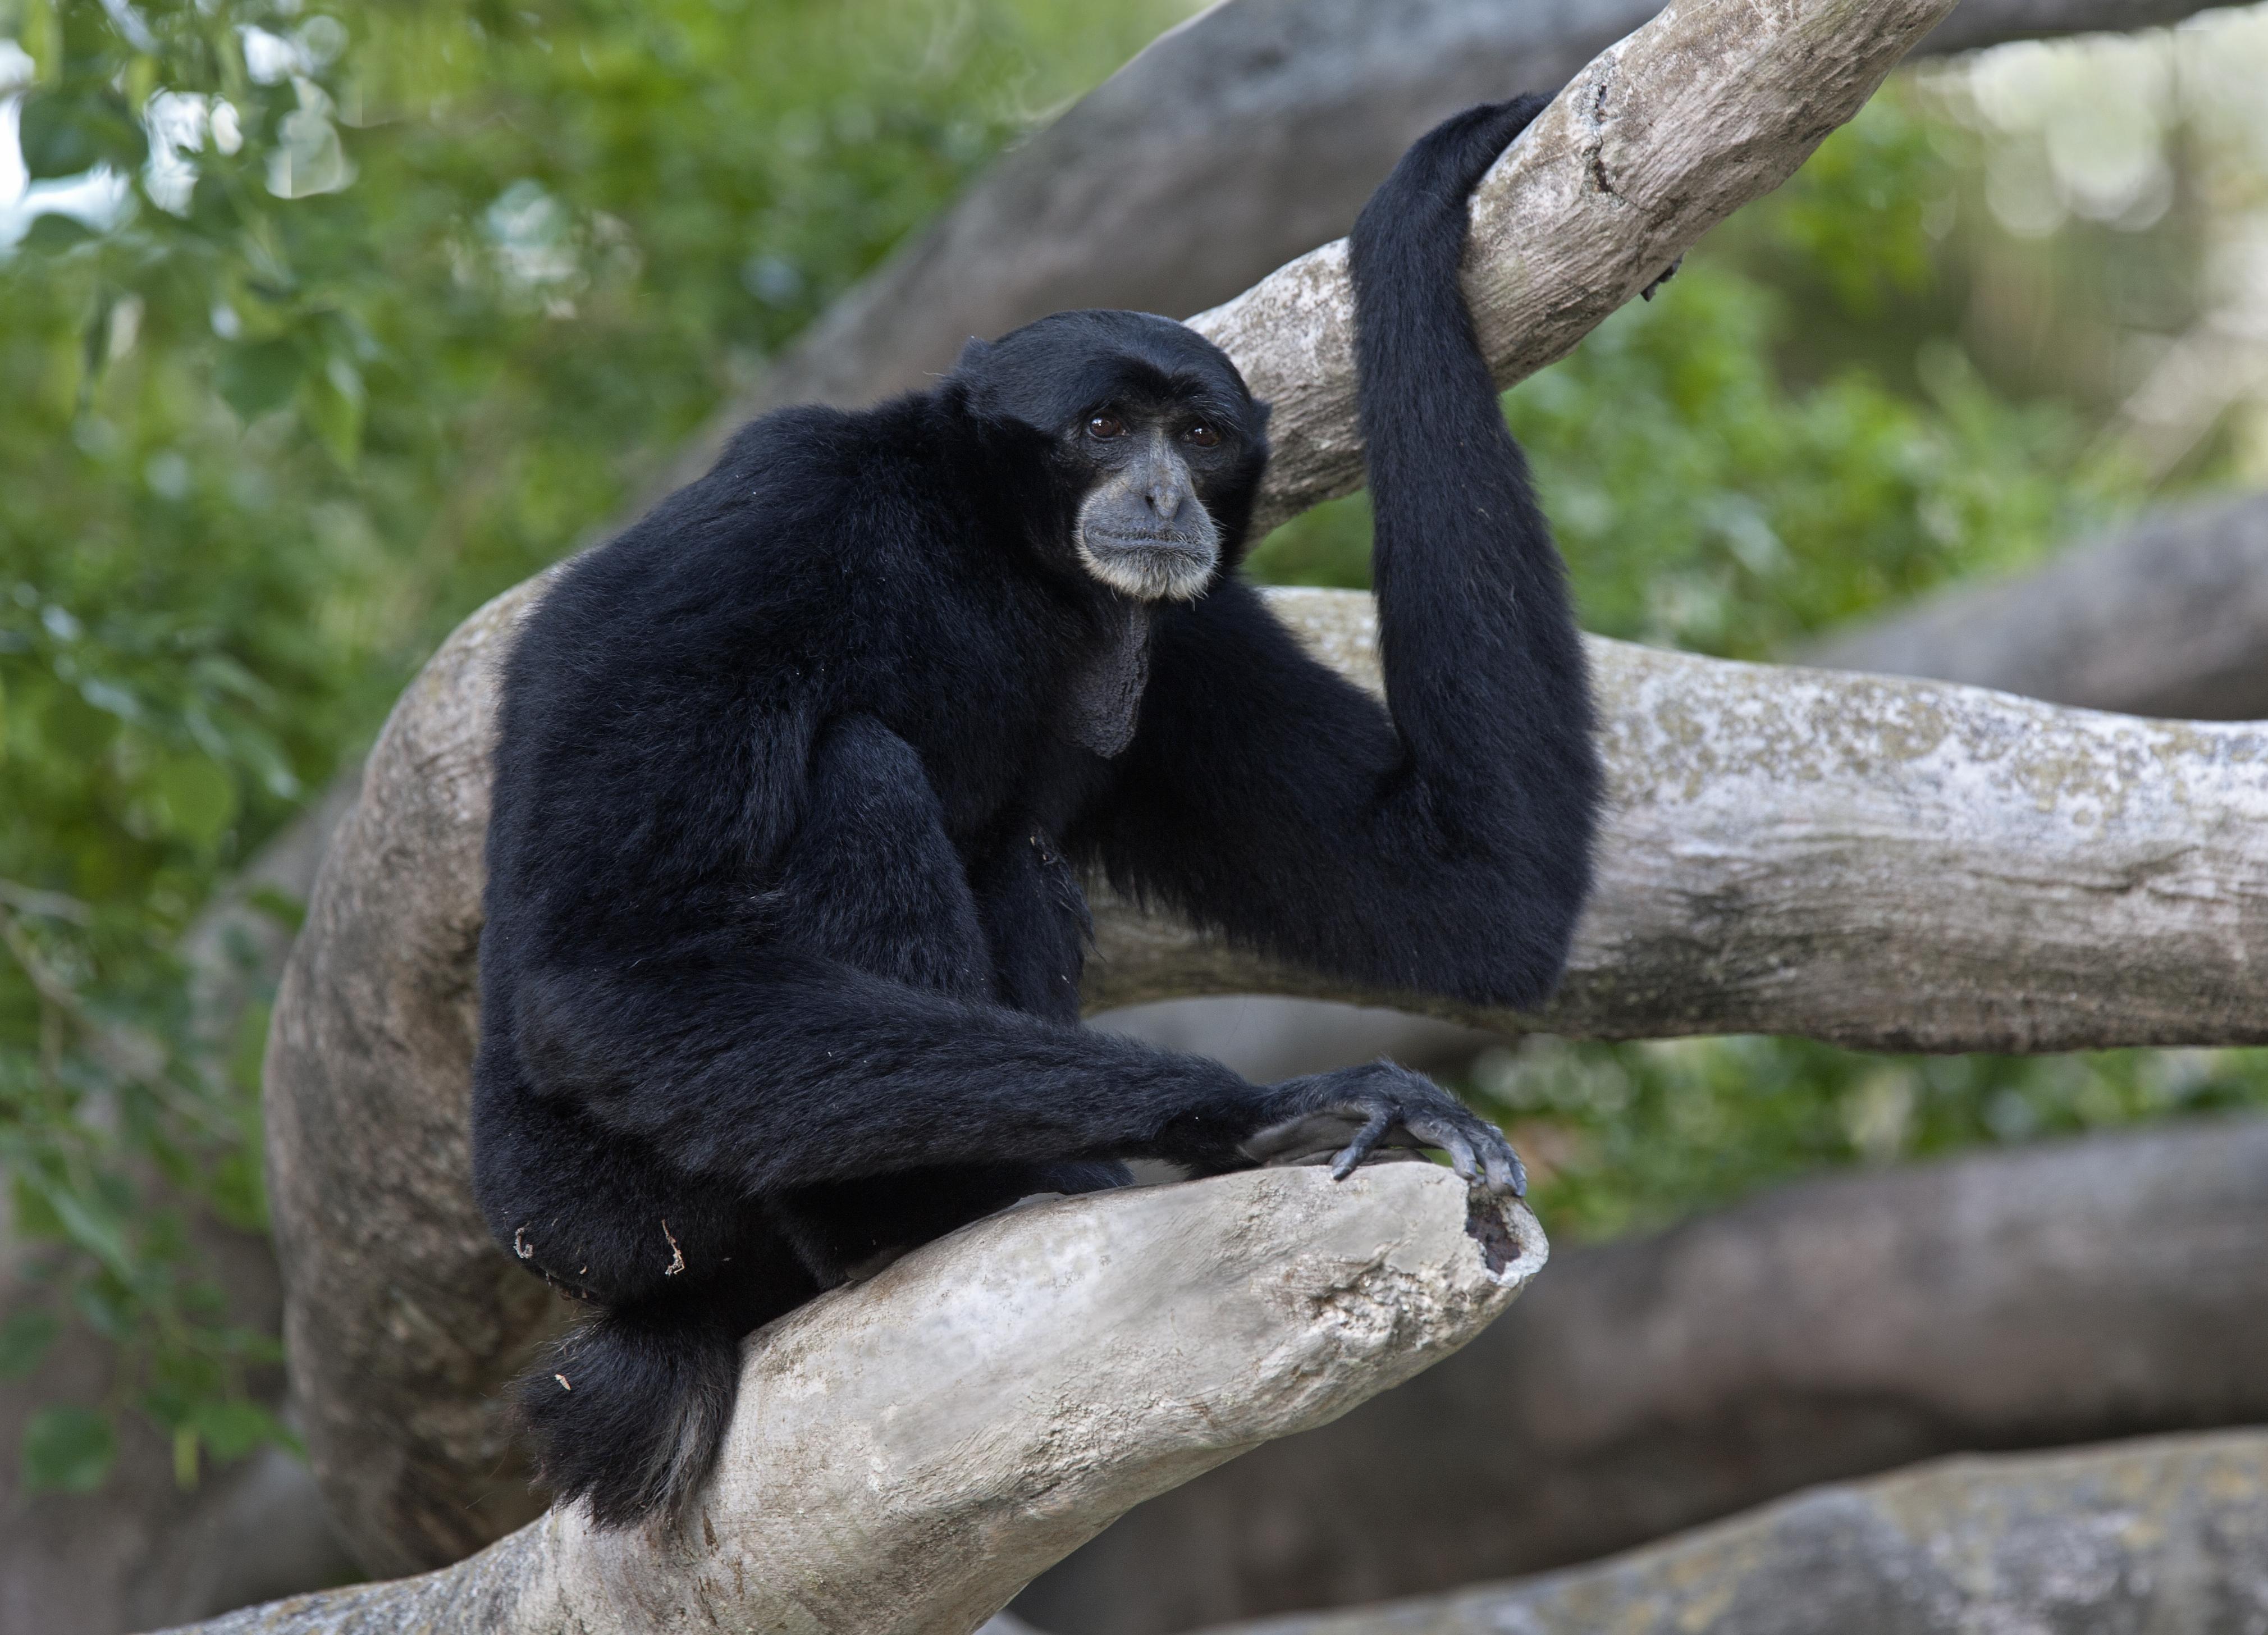 File:Siamang Miami Zoo.jpg - Wikimedia Commons